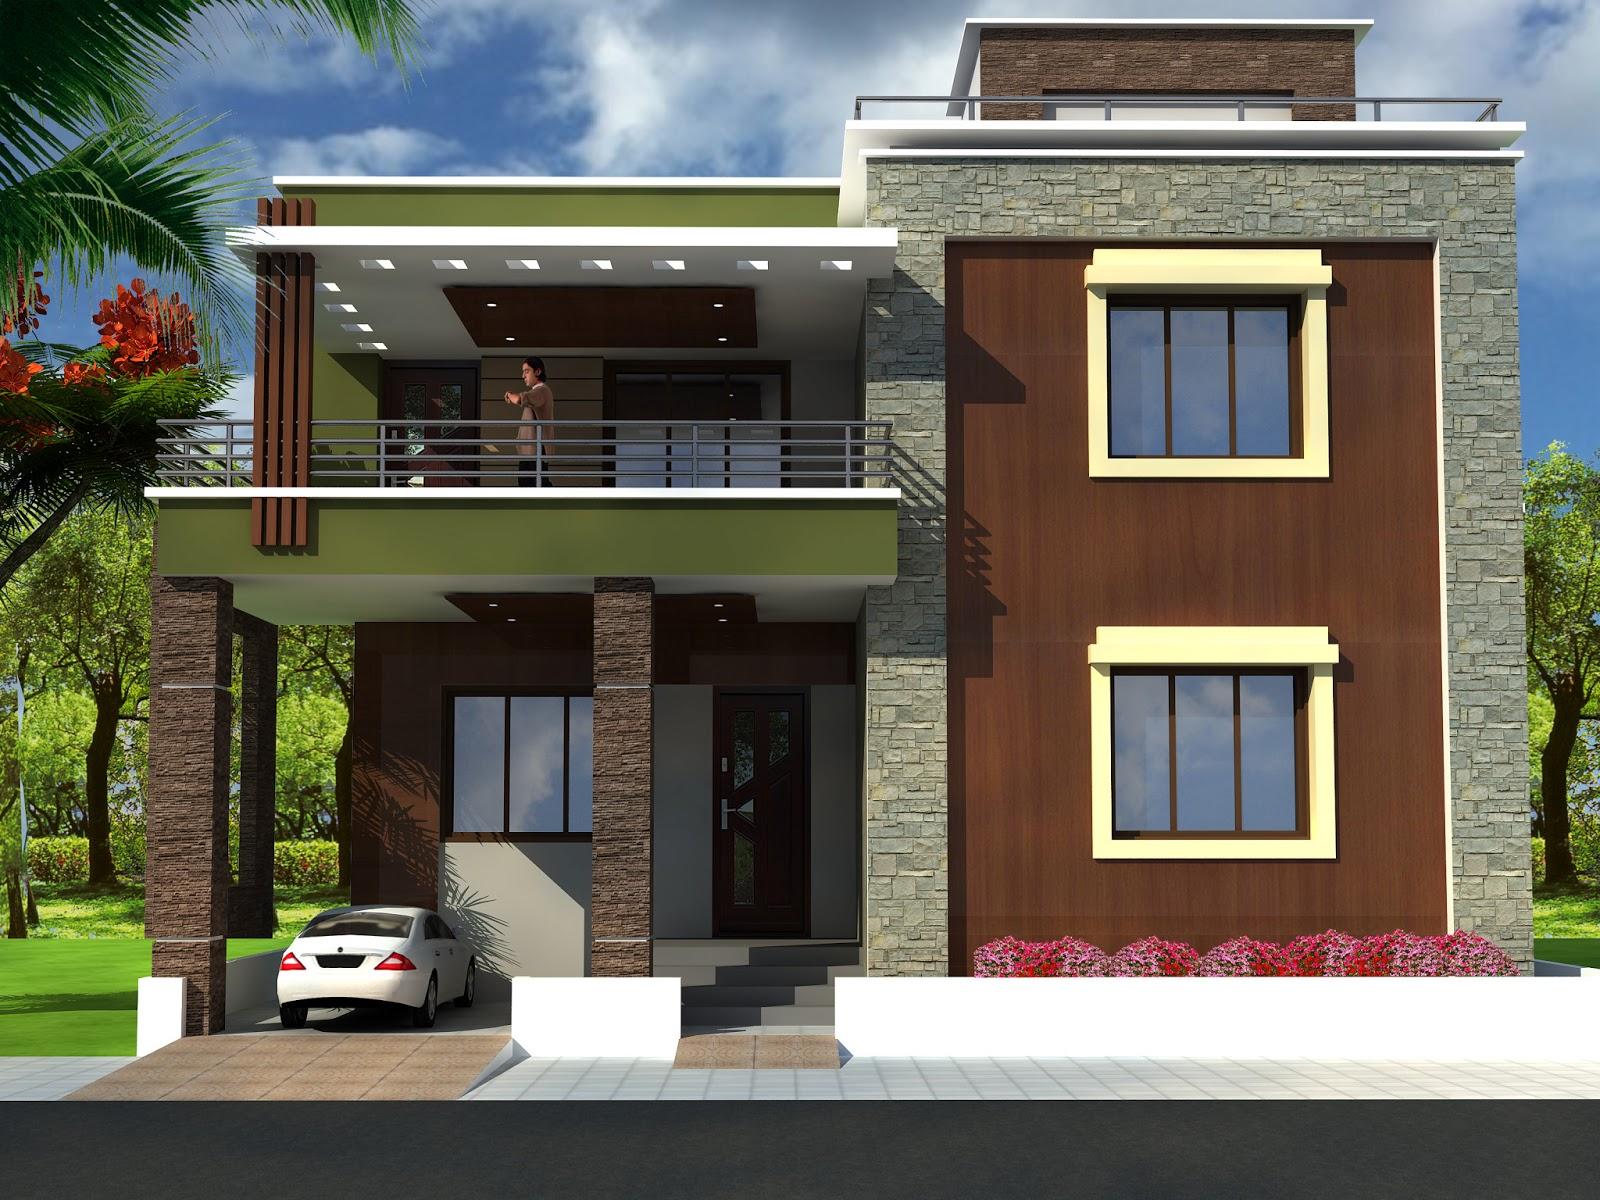 Living Room Designs For House exterior house design front elevation